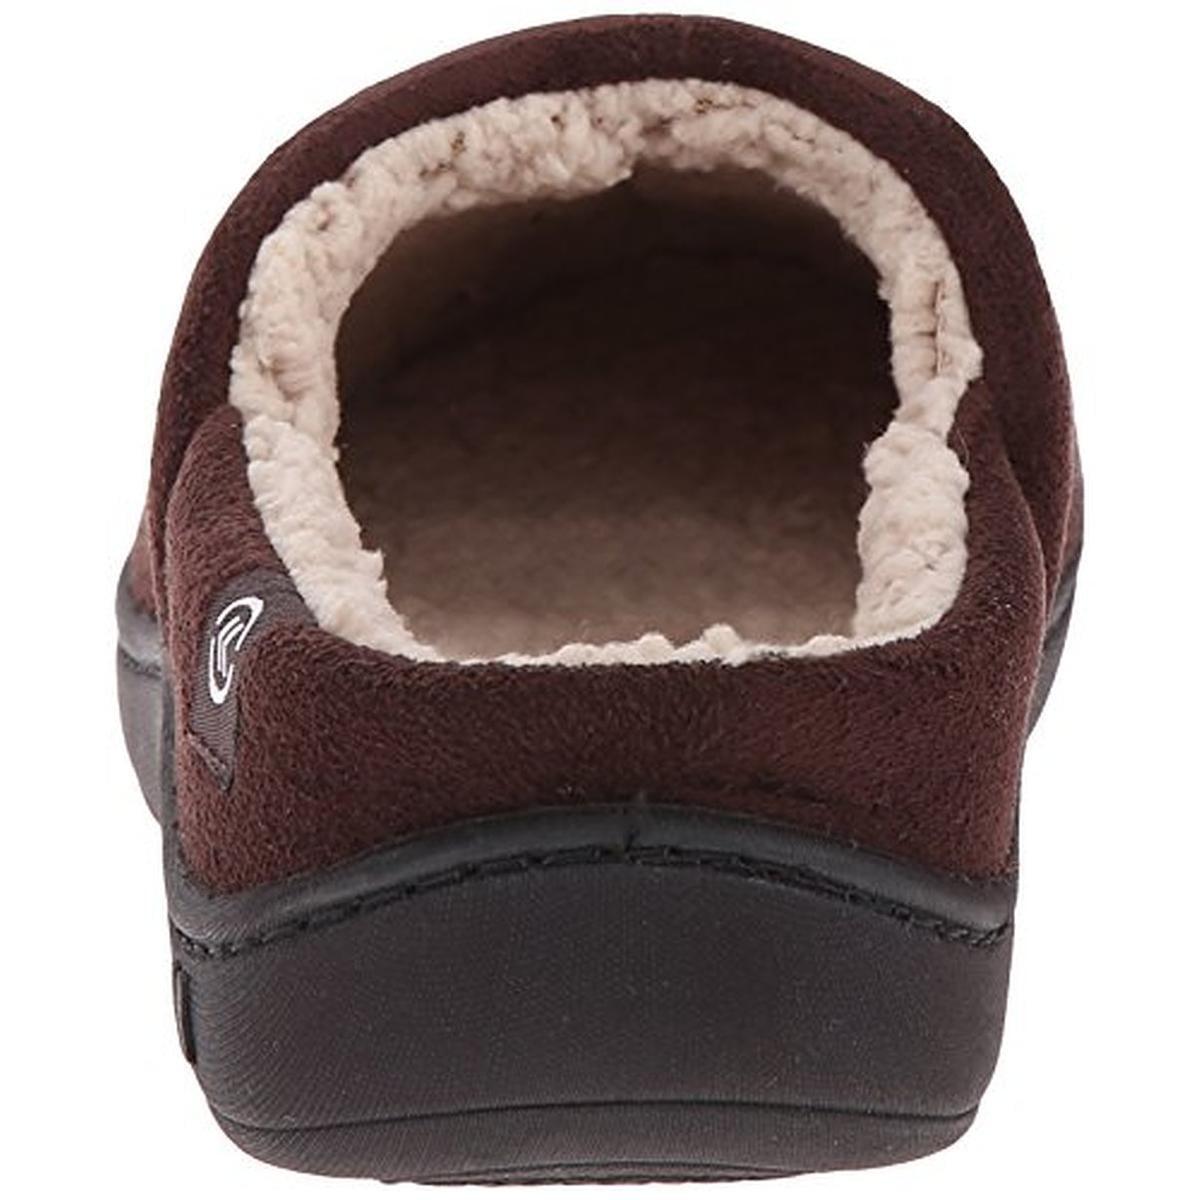 Isotoner Men's Chocolate Microsuede Hoodback Slipper